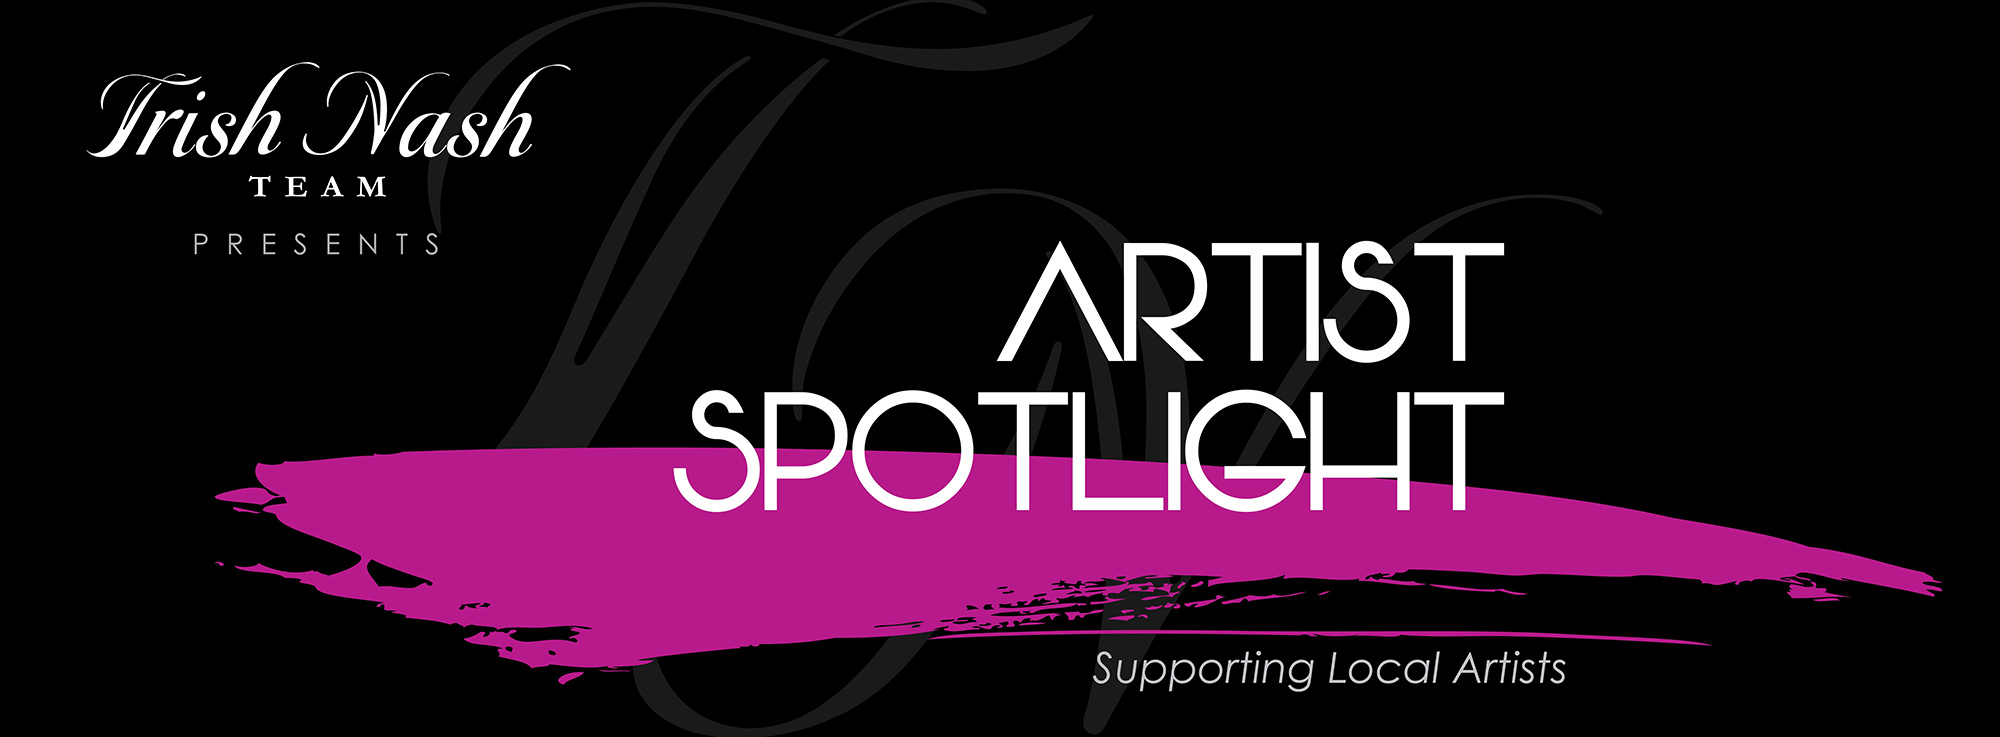 artist-spotlight-banner